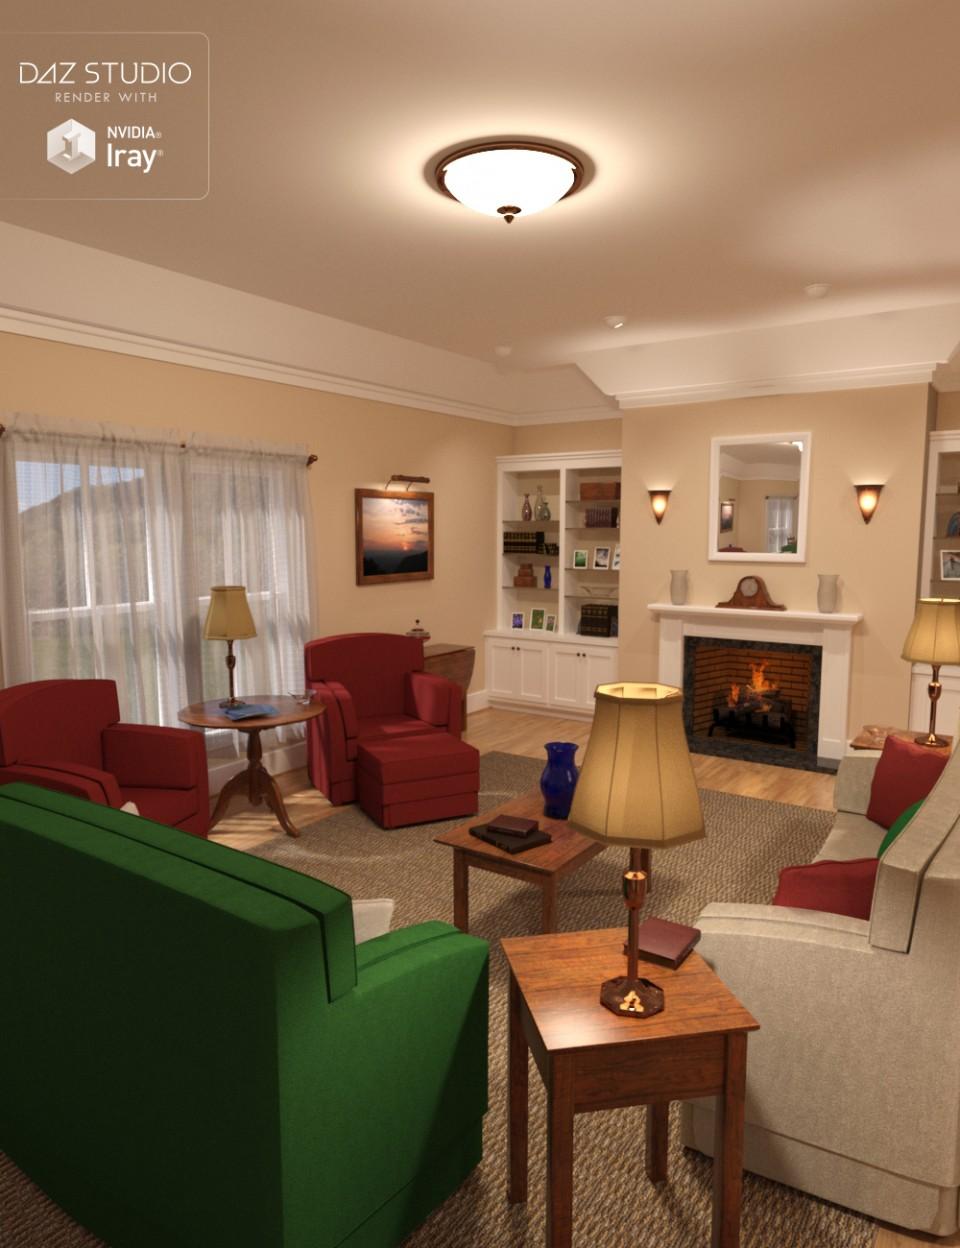 Simple Living – Living Room_DAZ3D下载站